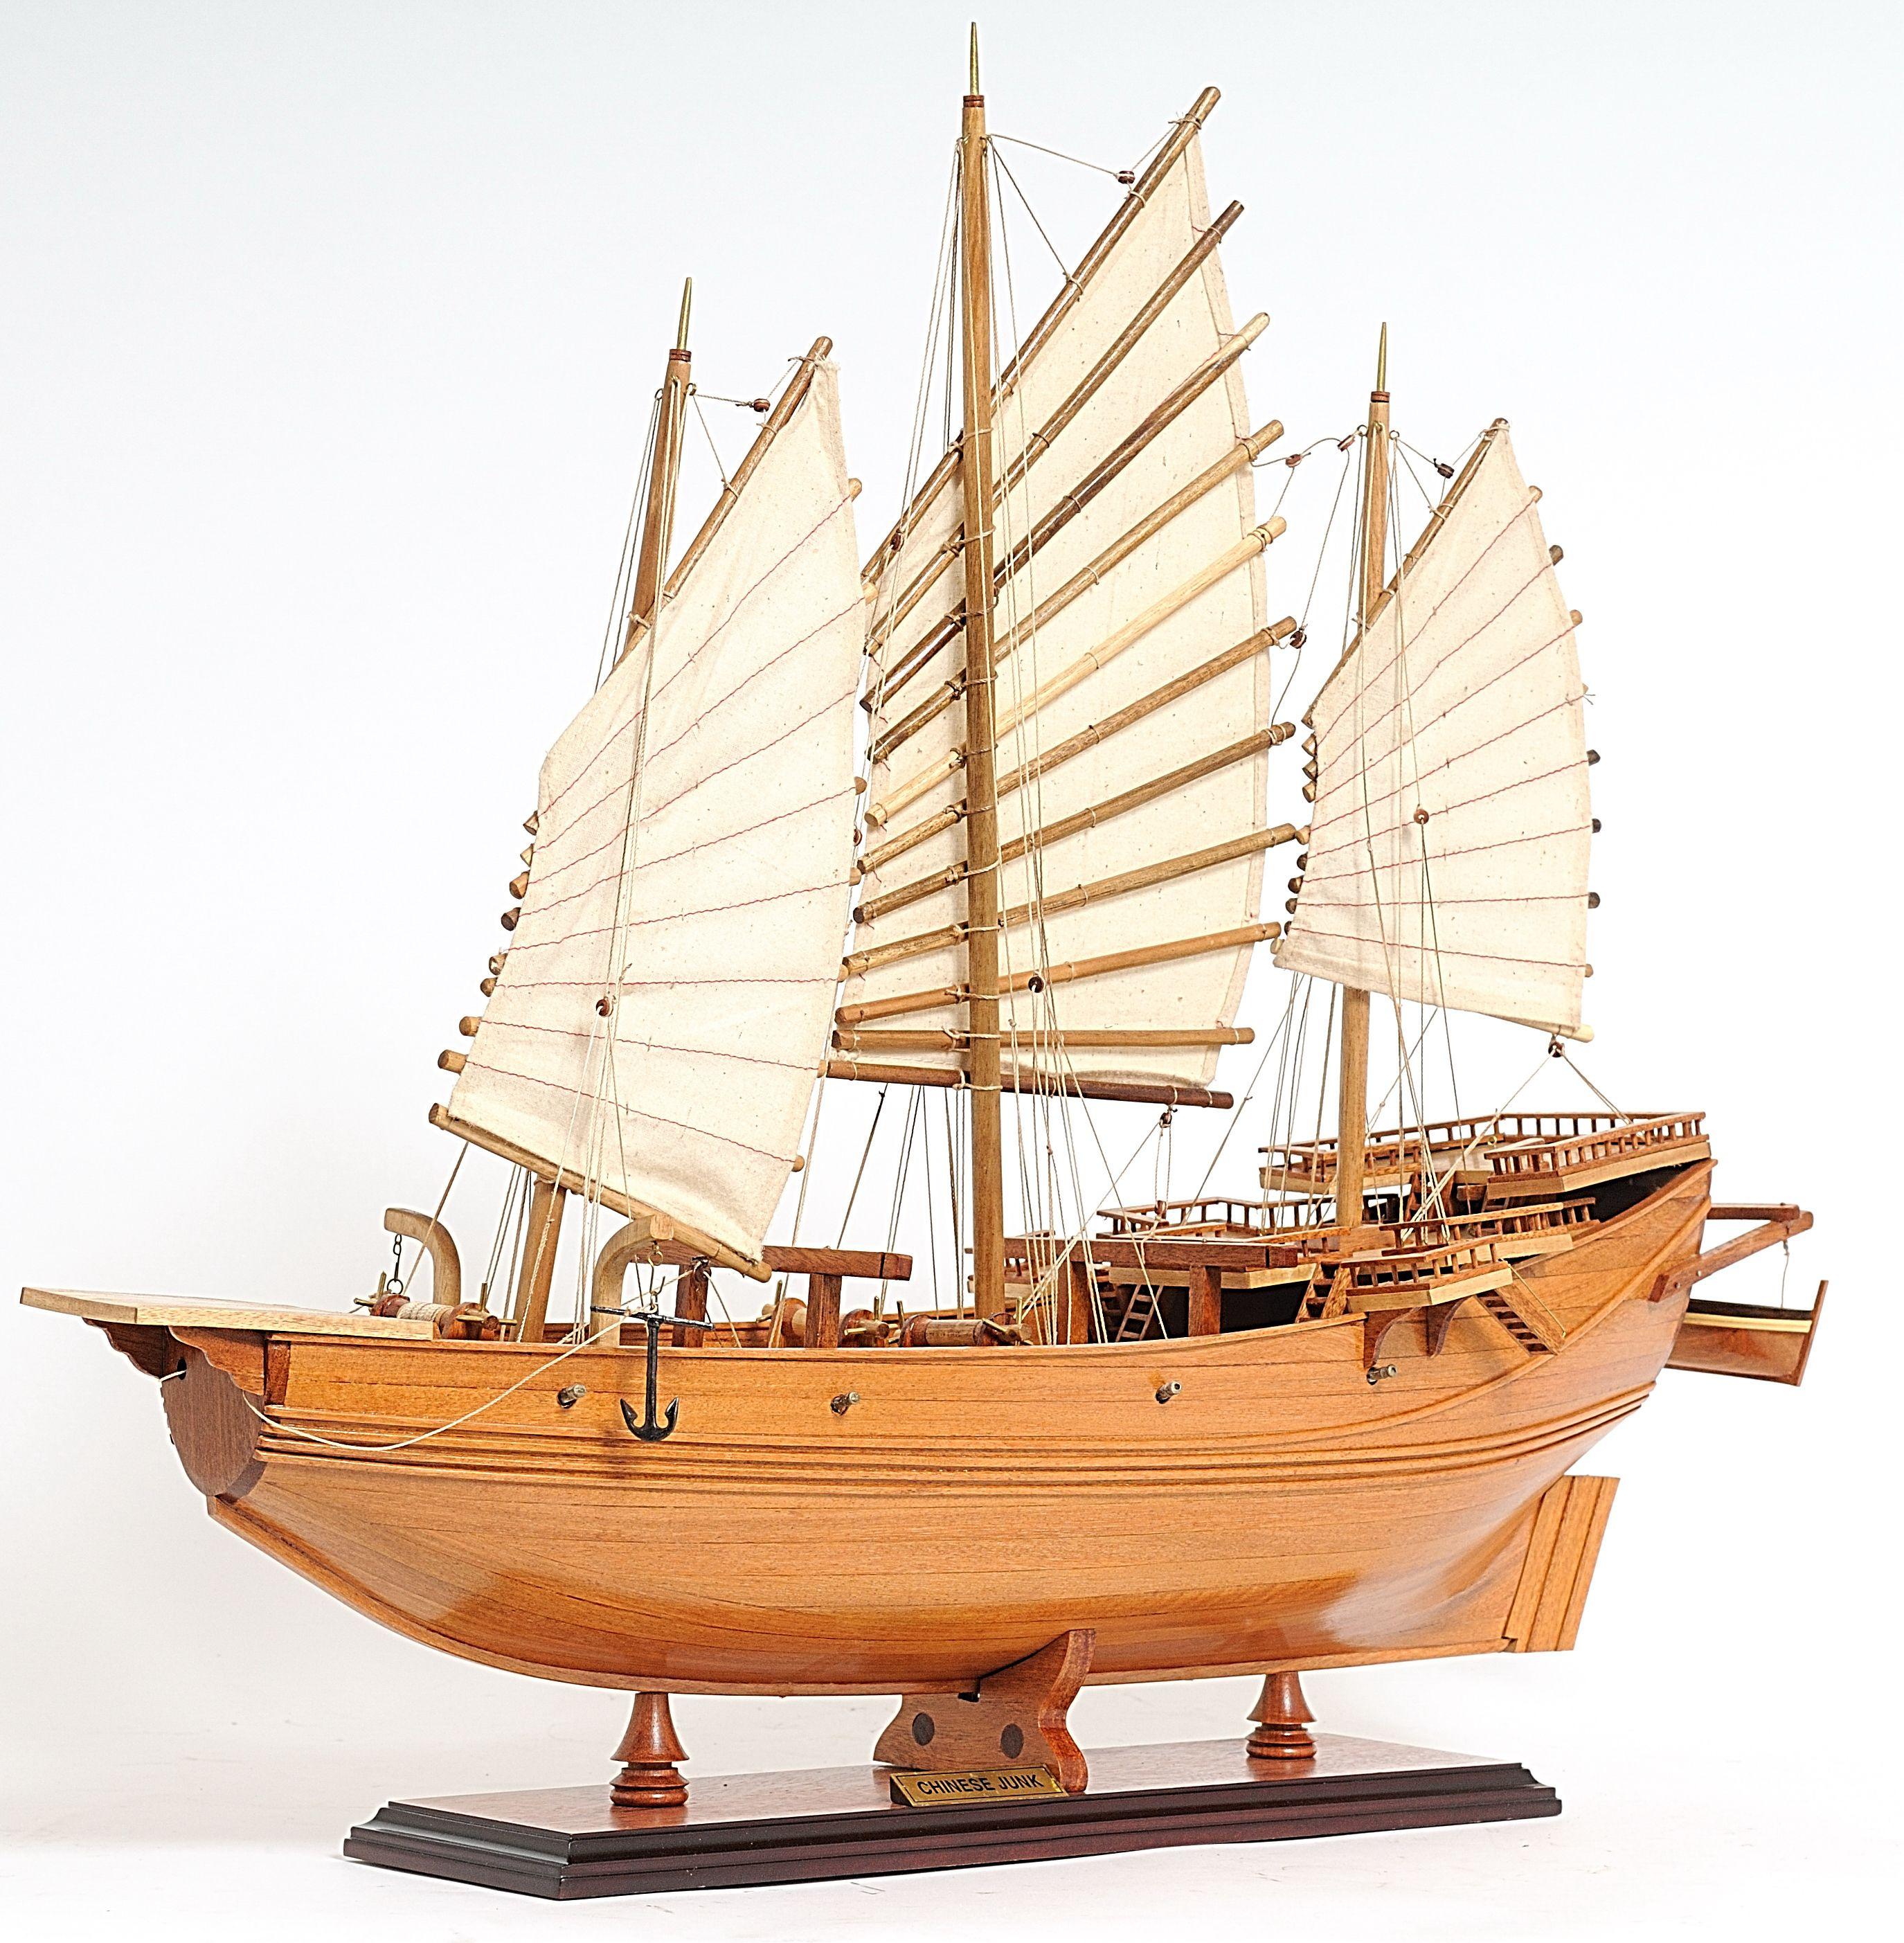 2238-13040-Chinese-Pirate-Junk-Model-Ship